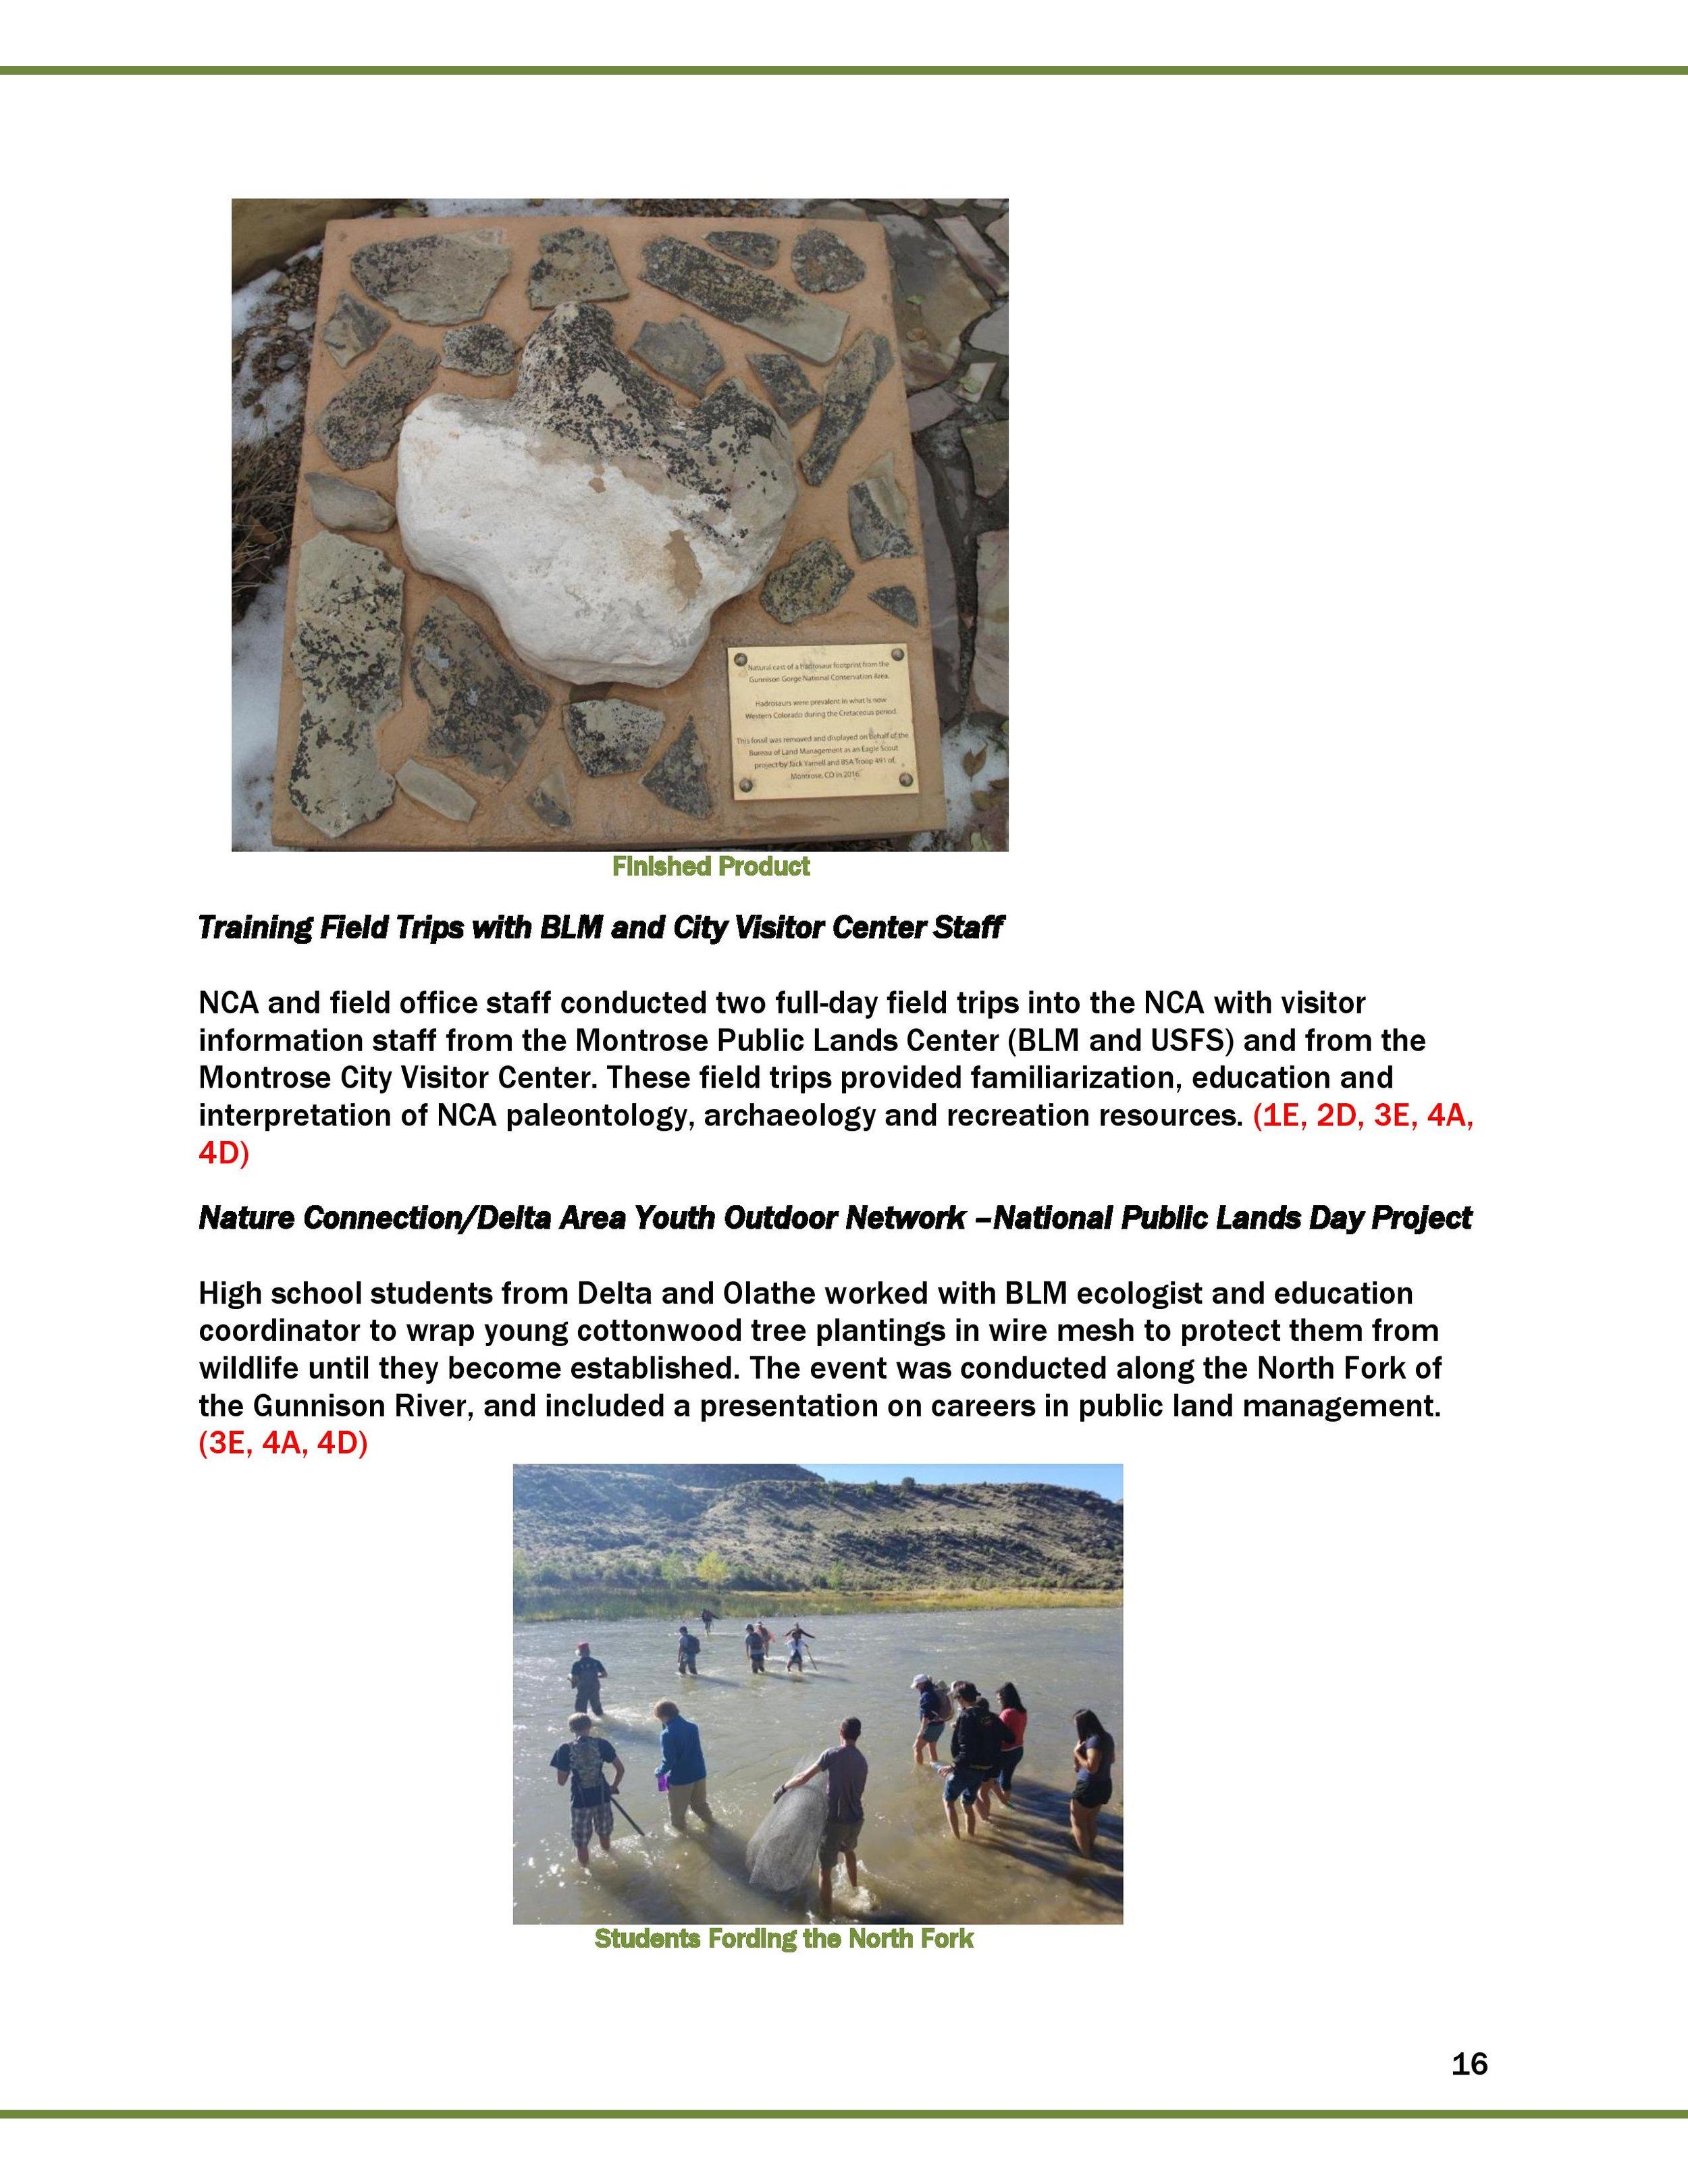 2016 FINAL GGNCA REPORT_2017_02_01-page-017.jpg